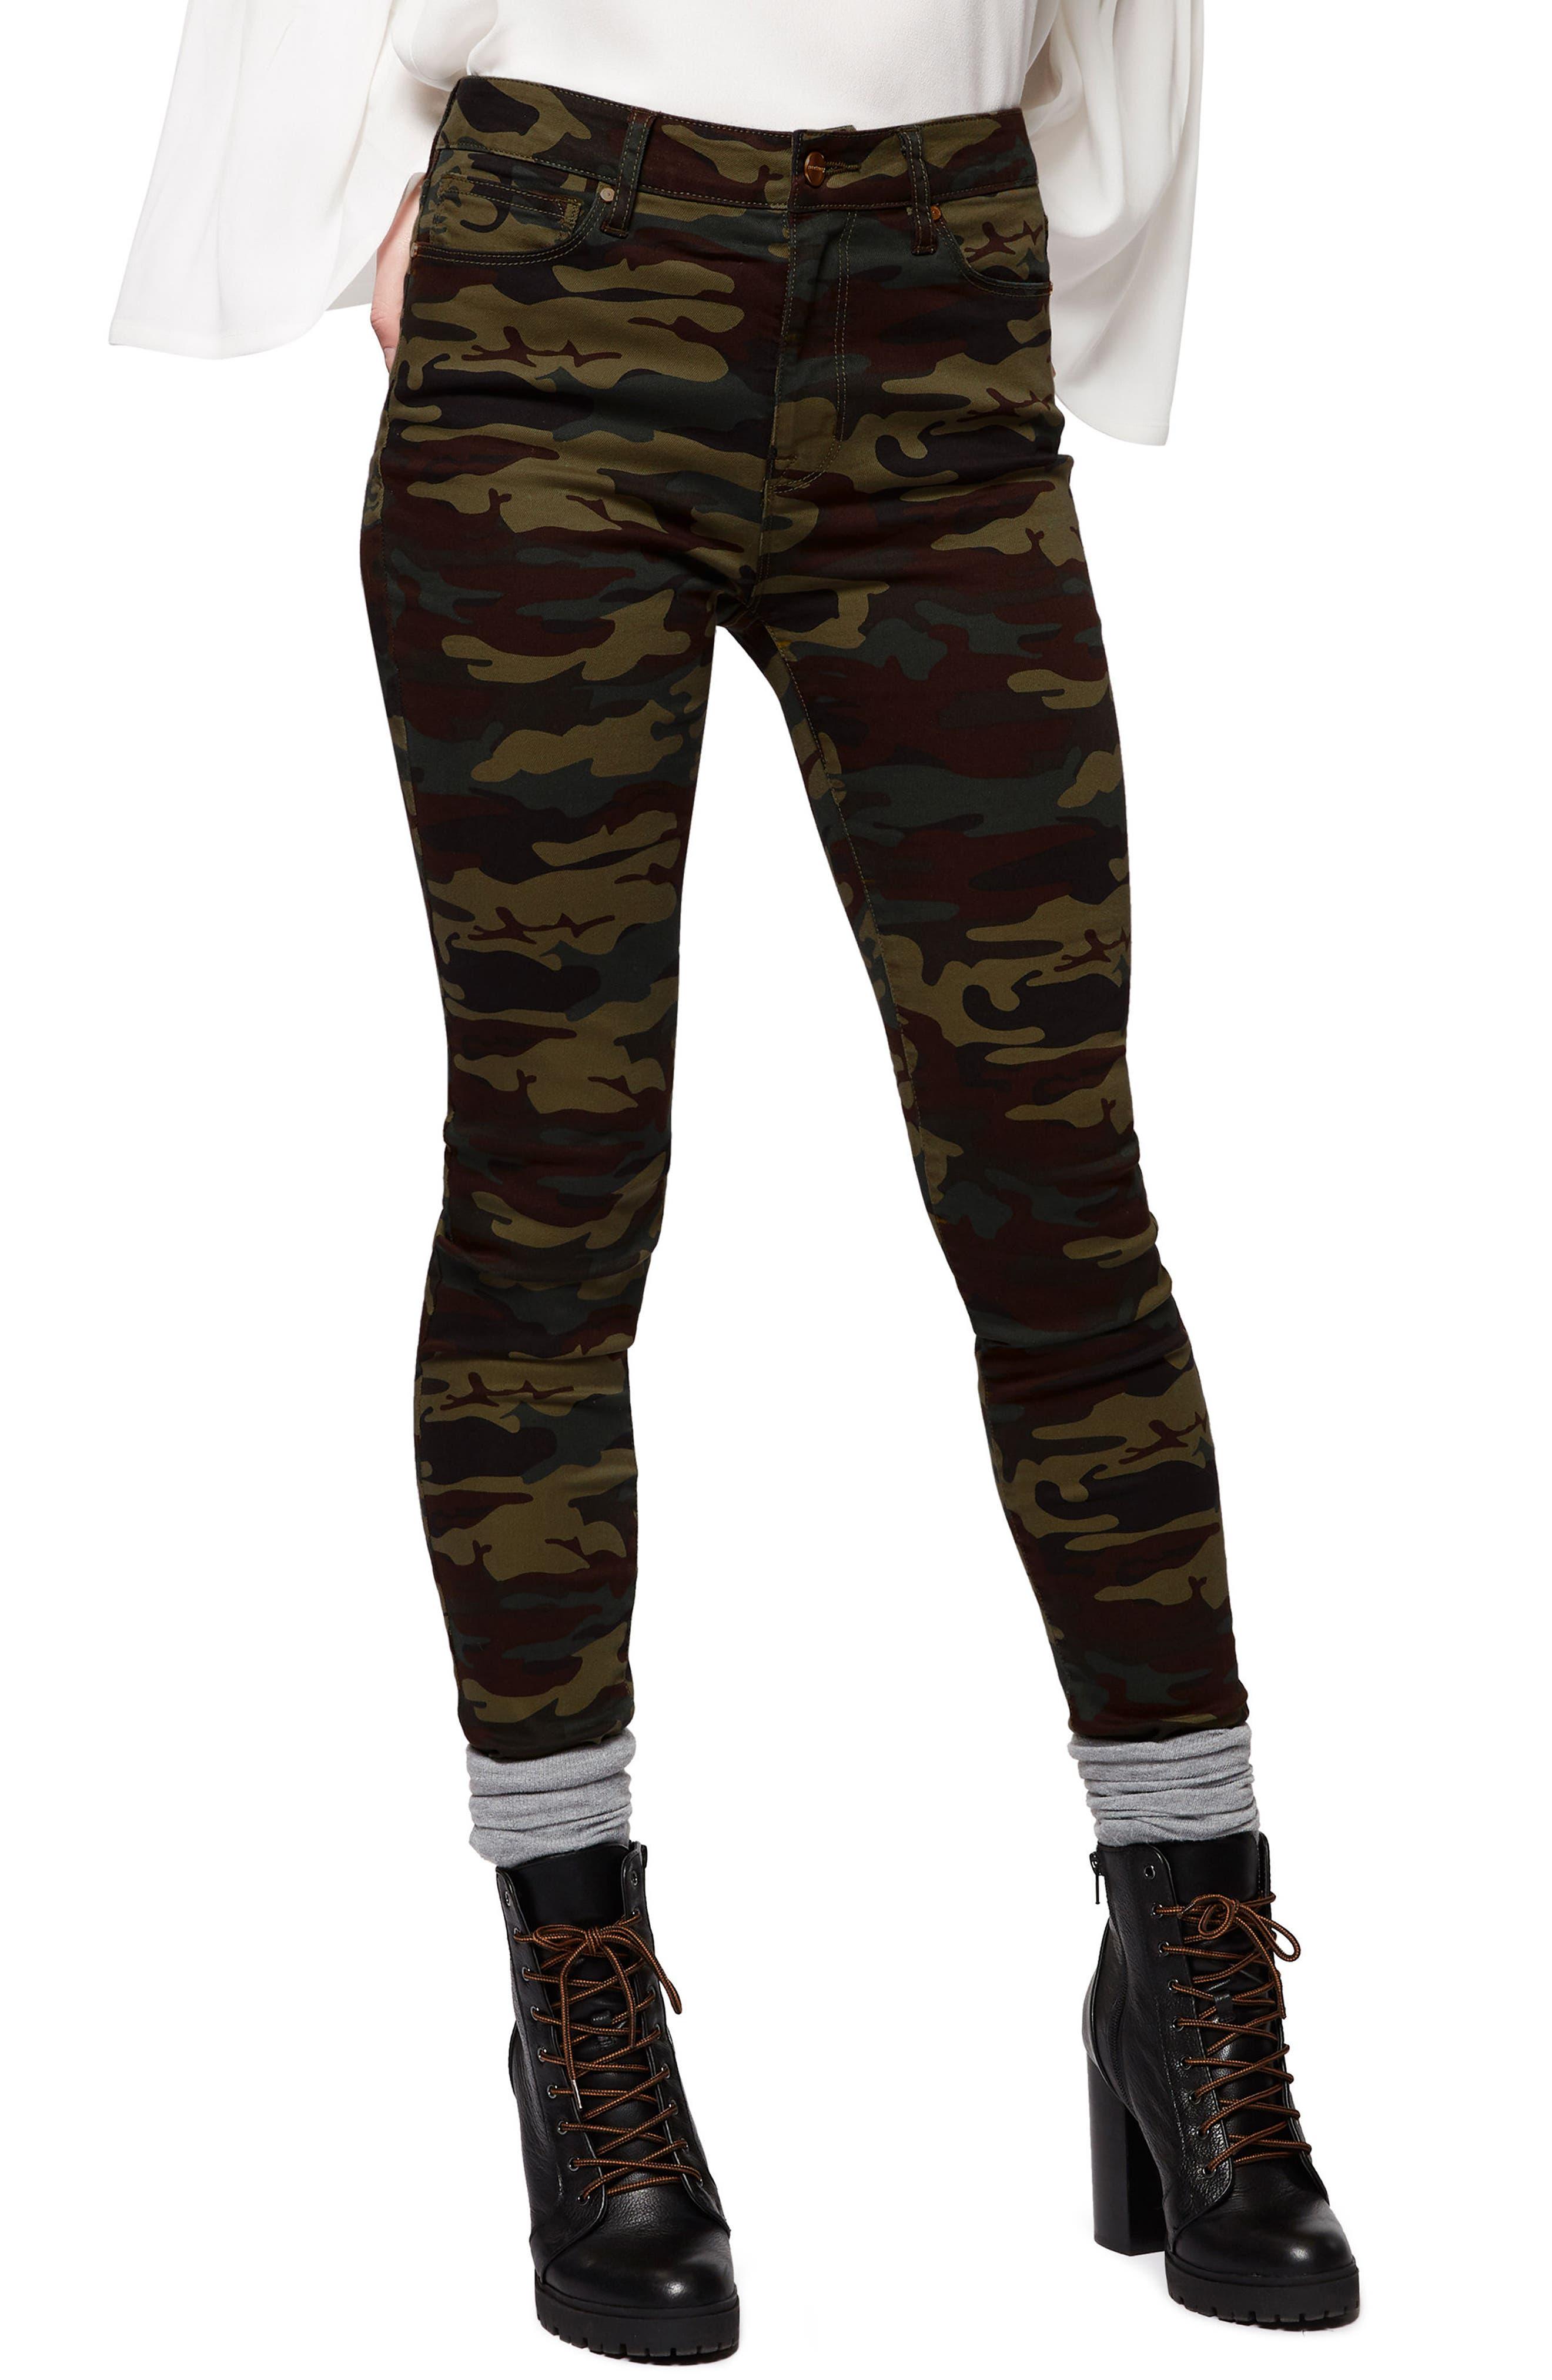 Robbie Camo Print Skinny Pants,                             Main thumbnail 1, color,                             Camp Camo